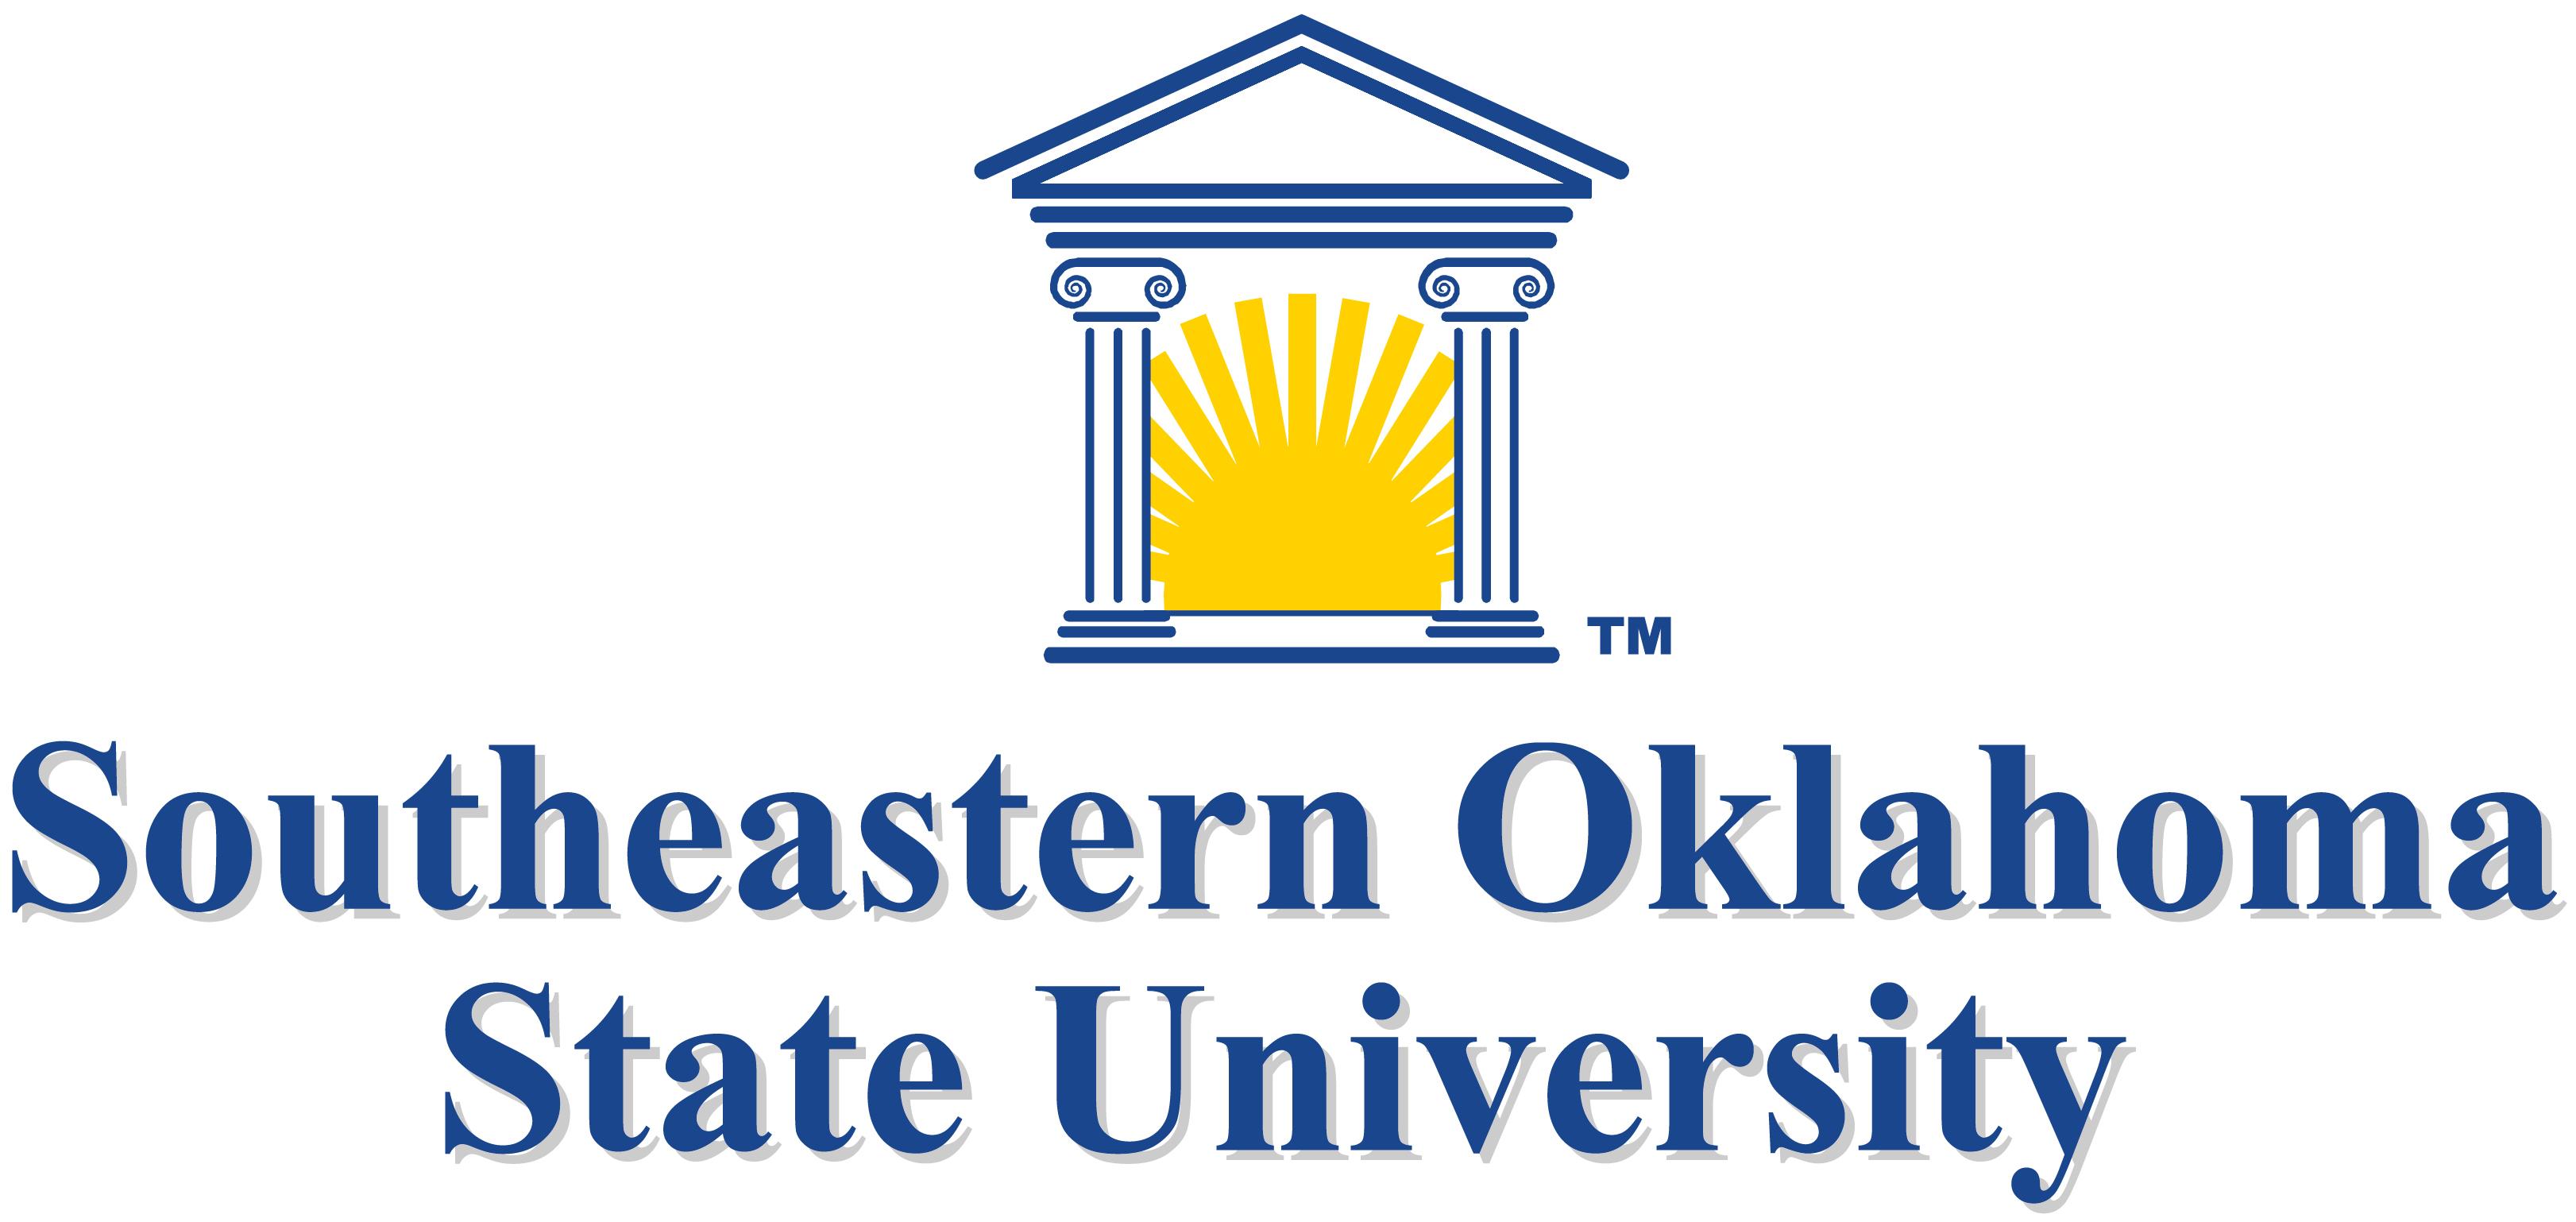 Southeastern Oklahoma State University >> Southeastern Oklahoma State University Finance Degrees